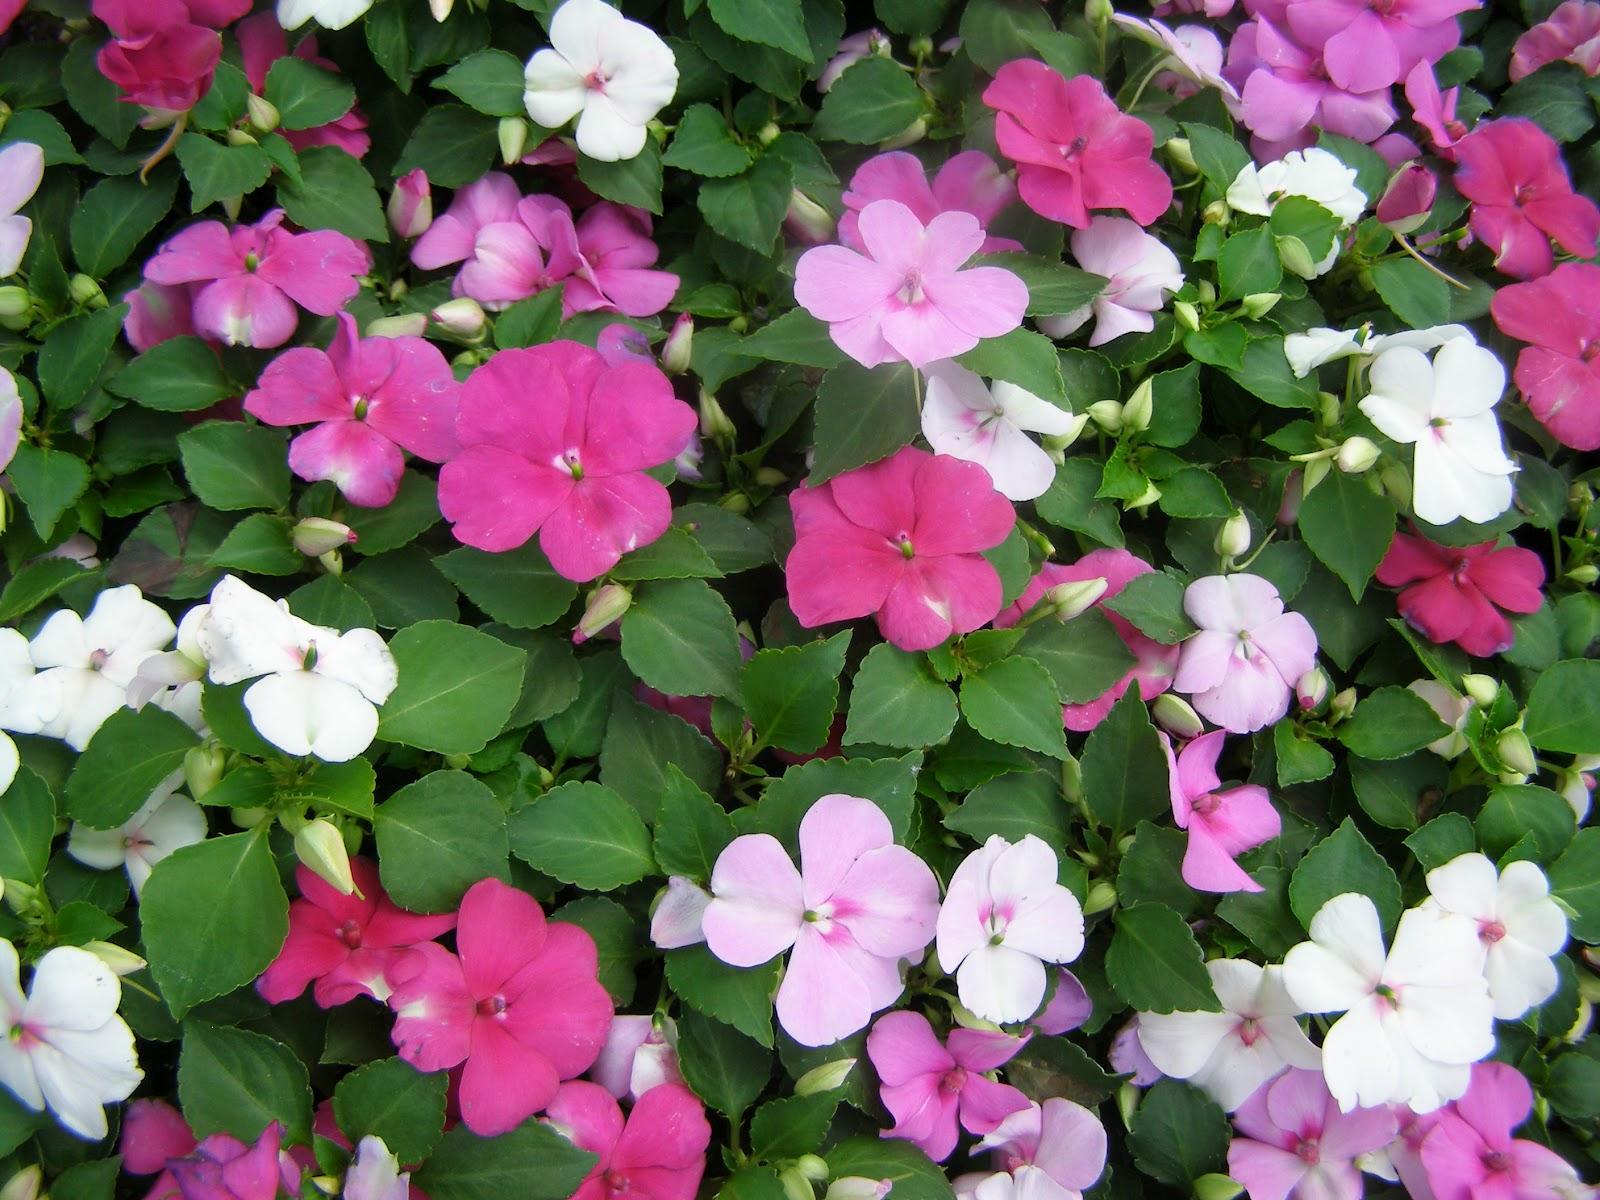 flowers for flower lovers Impatiens flowers